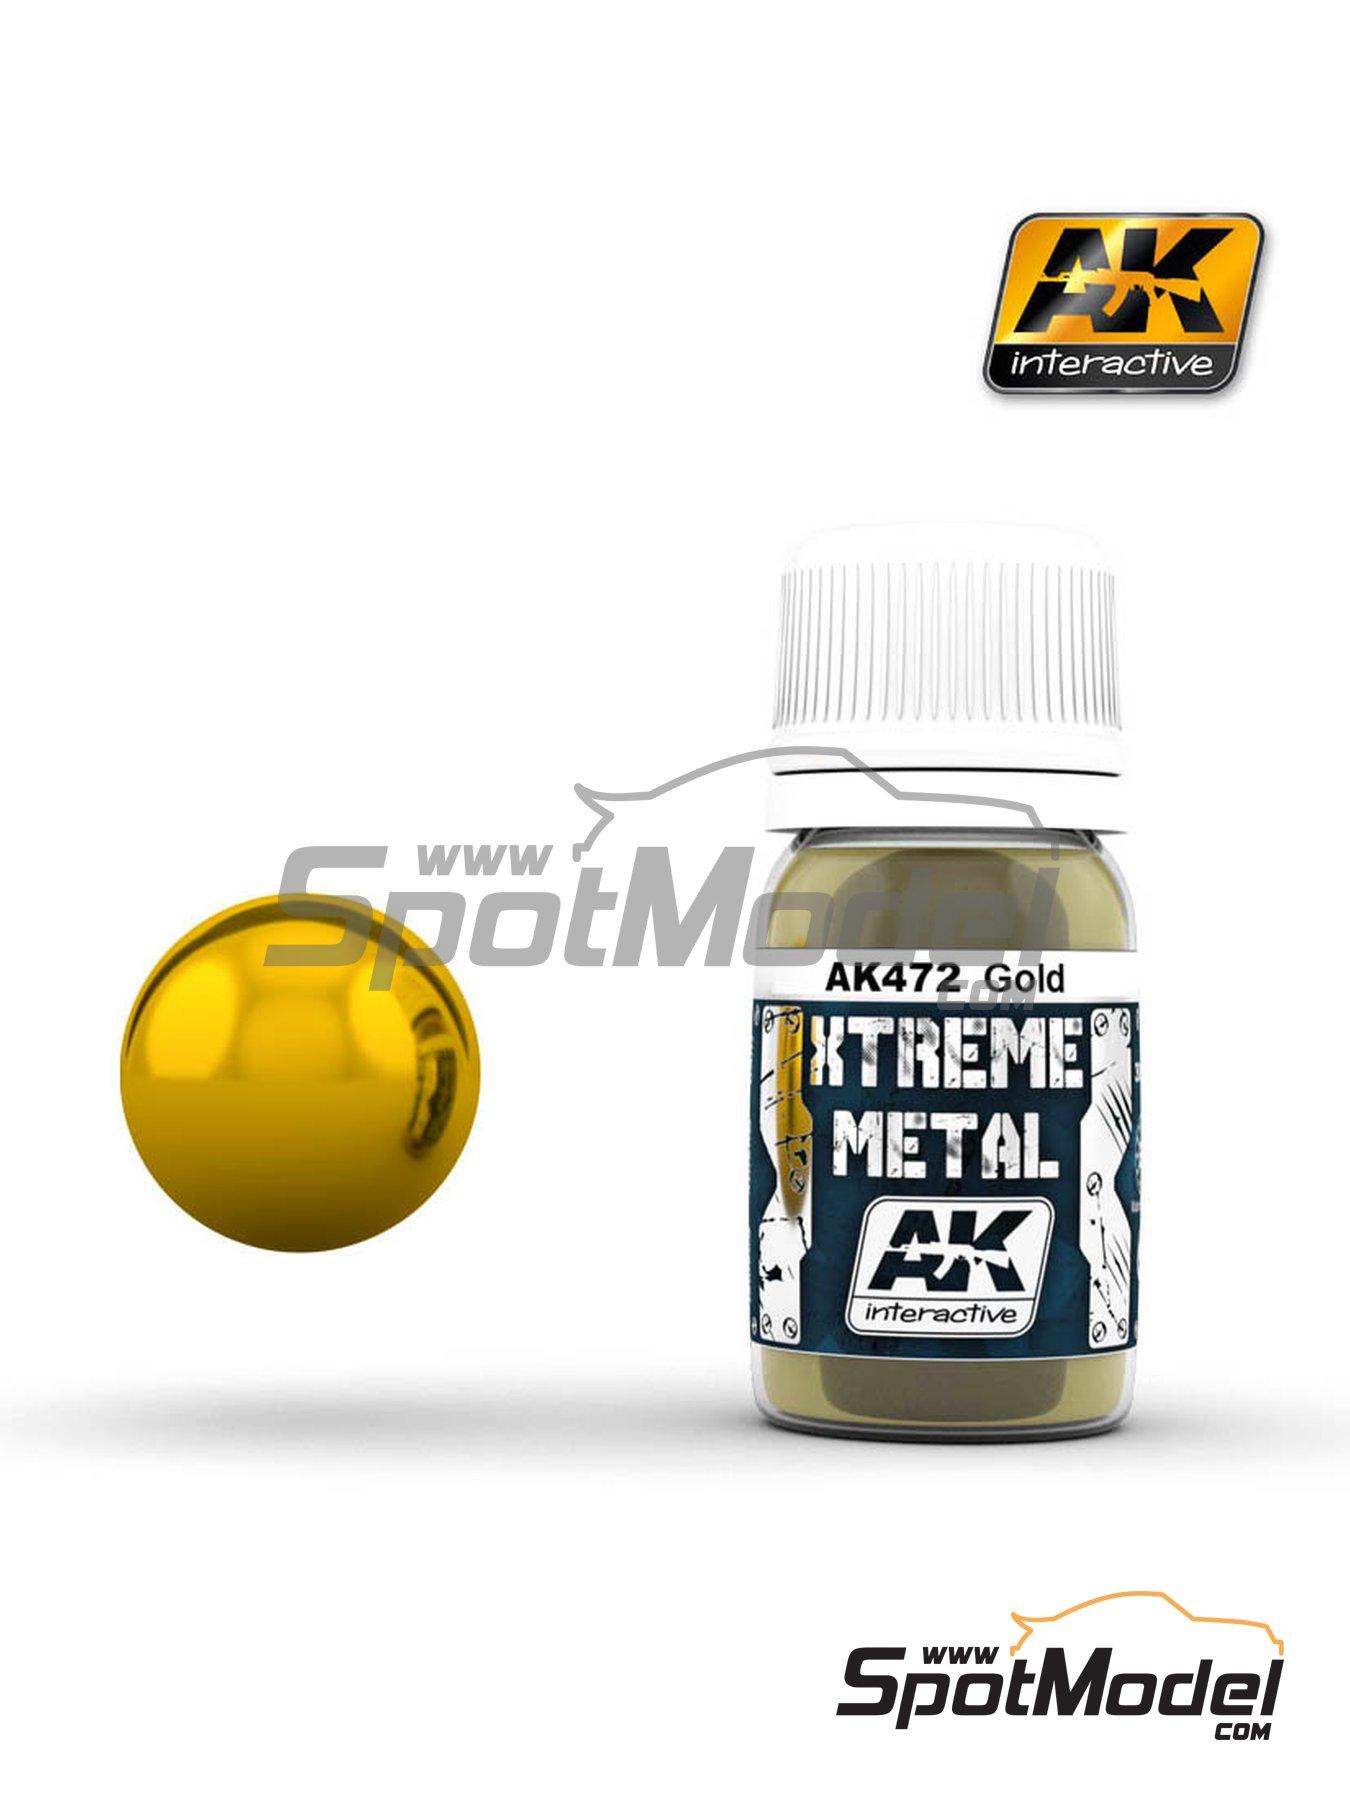 Dorado | Pintura Xtreme metal fabricado por AK Interactive (ref.AK-472) image